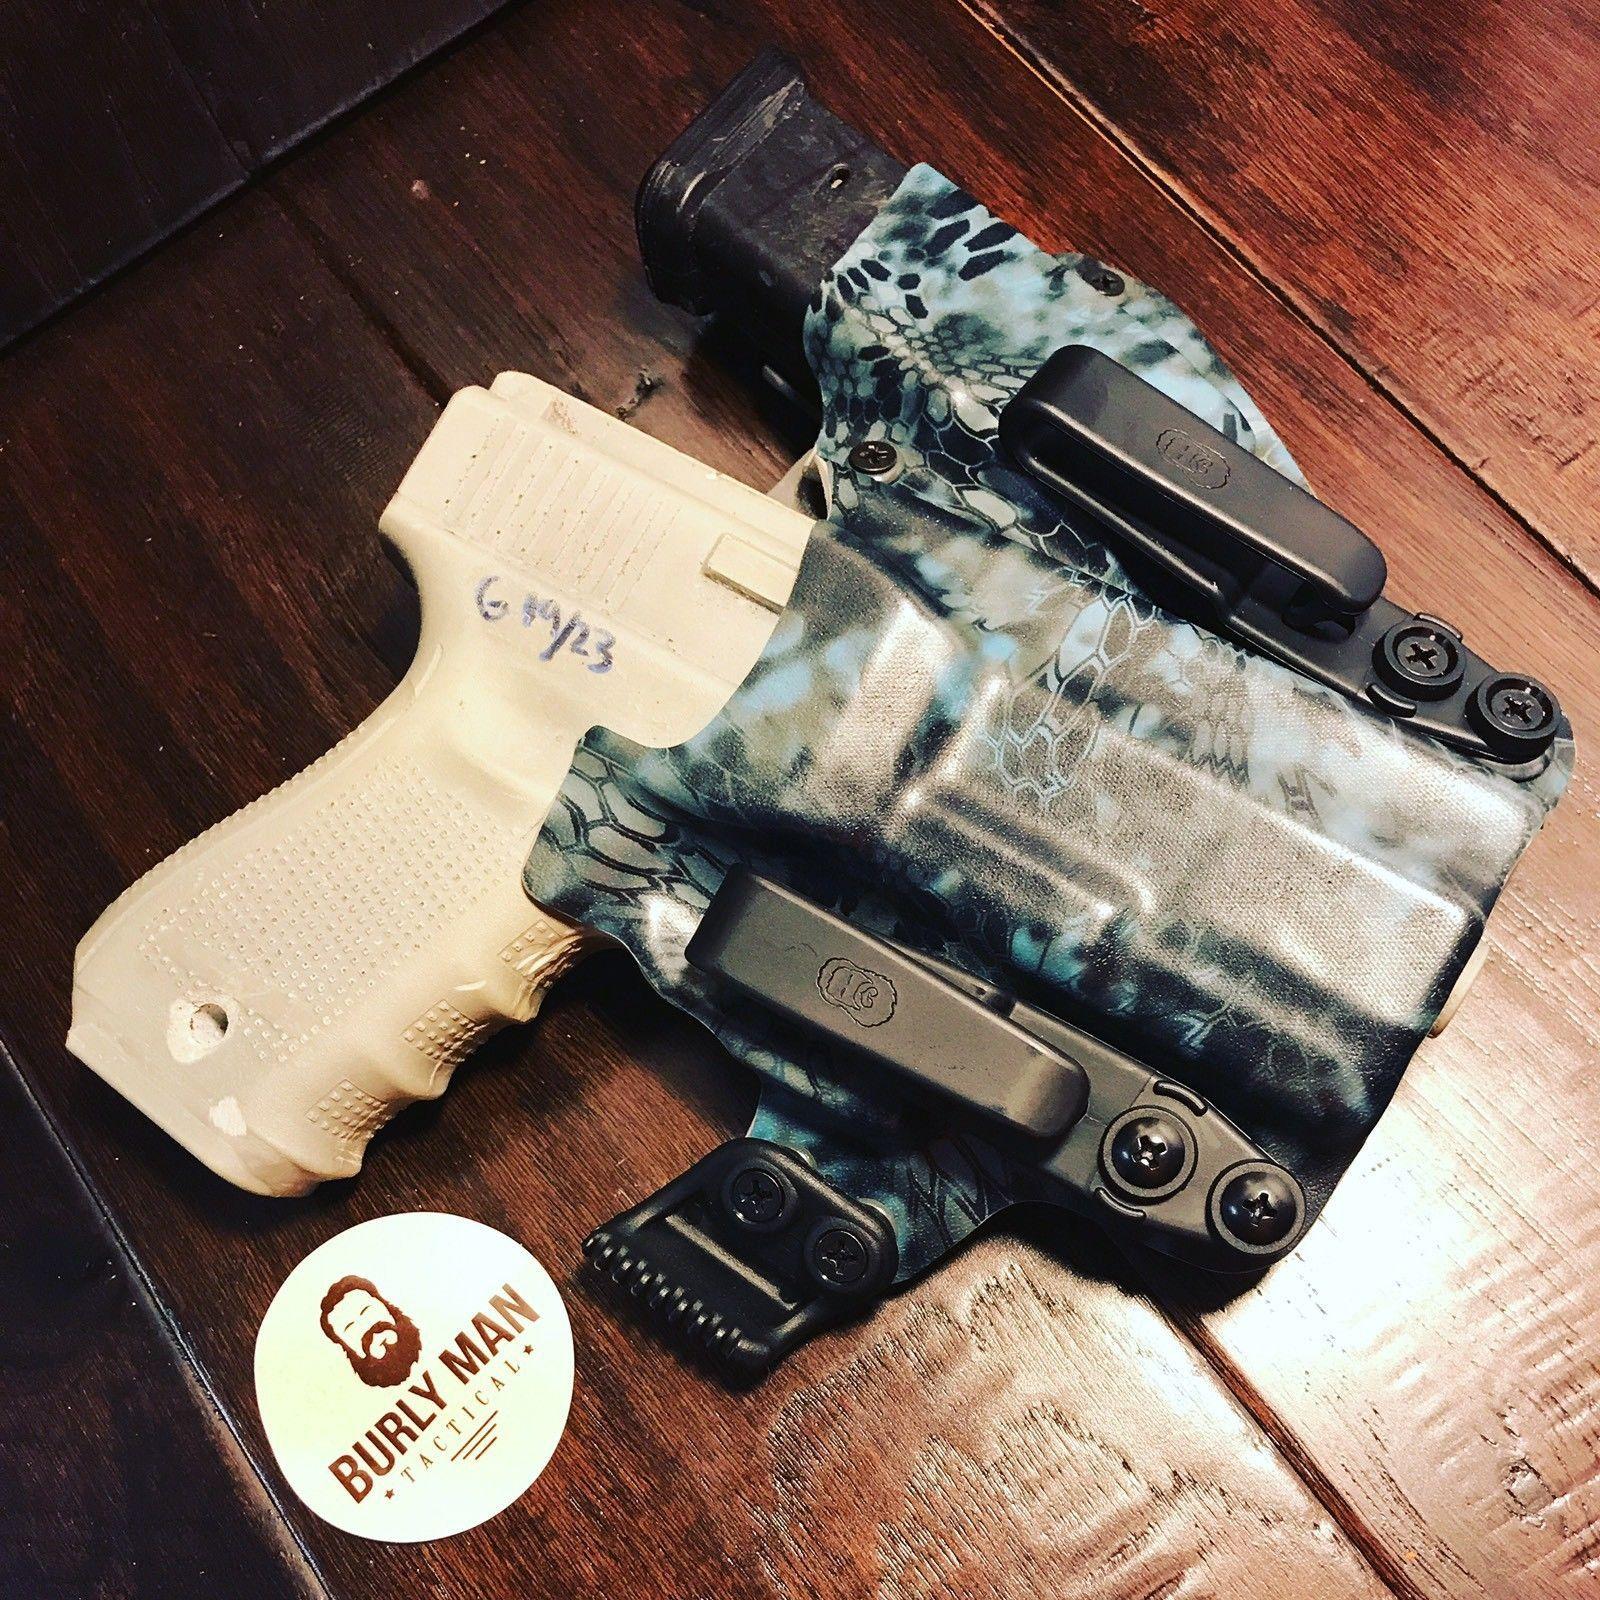 Glock 20 Kryptek Neptune IWB Appendix Made in the USA by